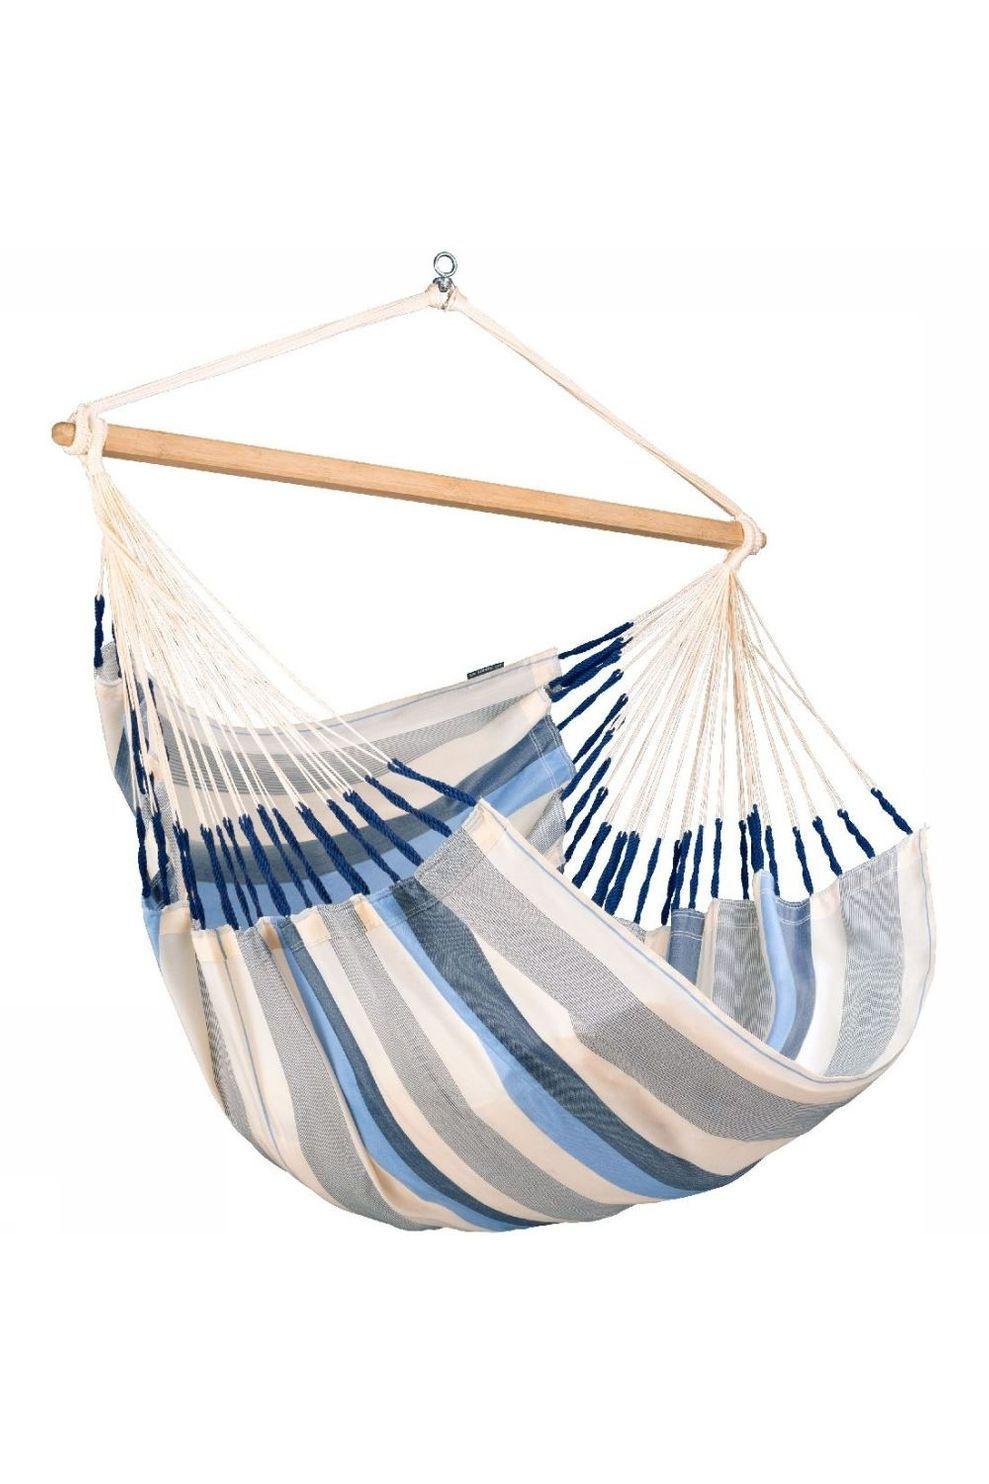 La Siesta Hangmat Domingo Lounger Chair - Blauw